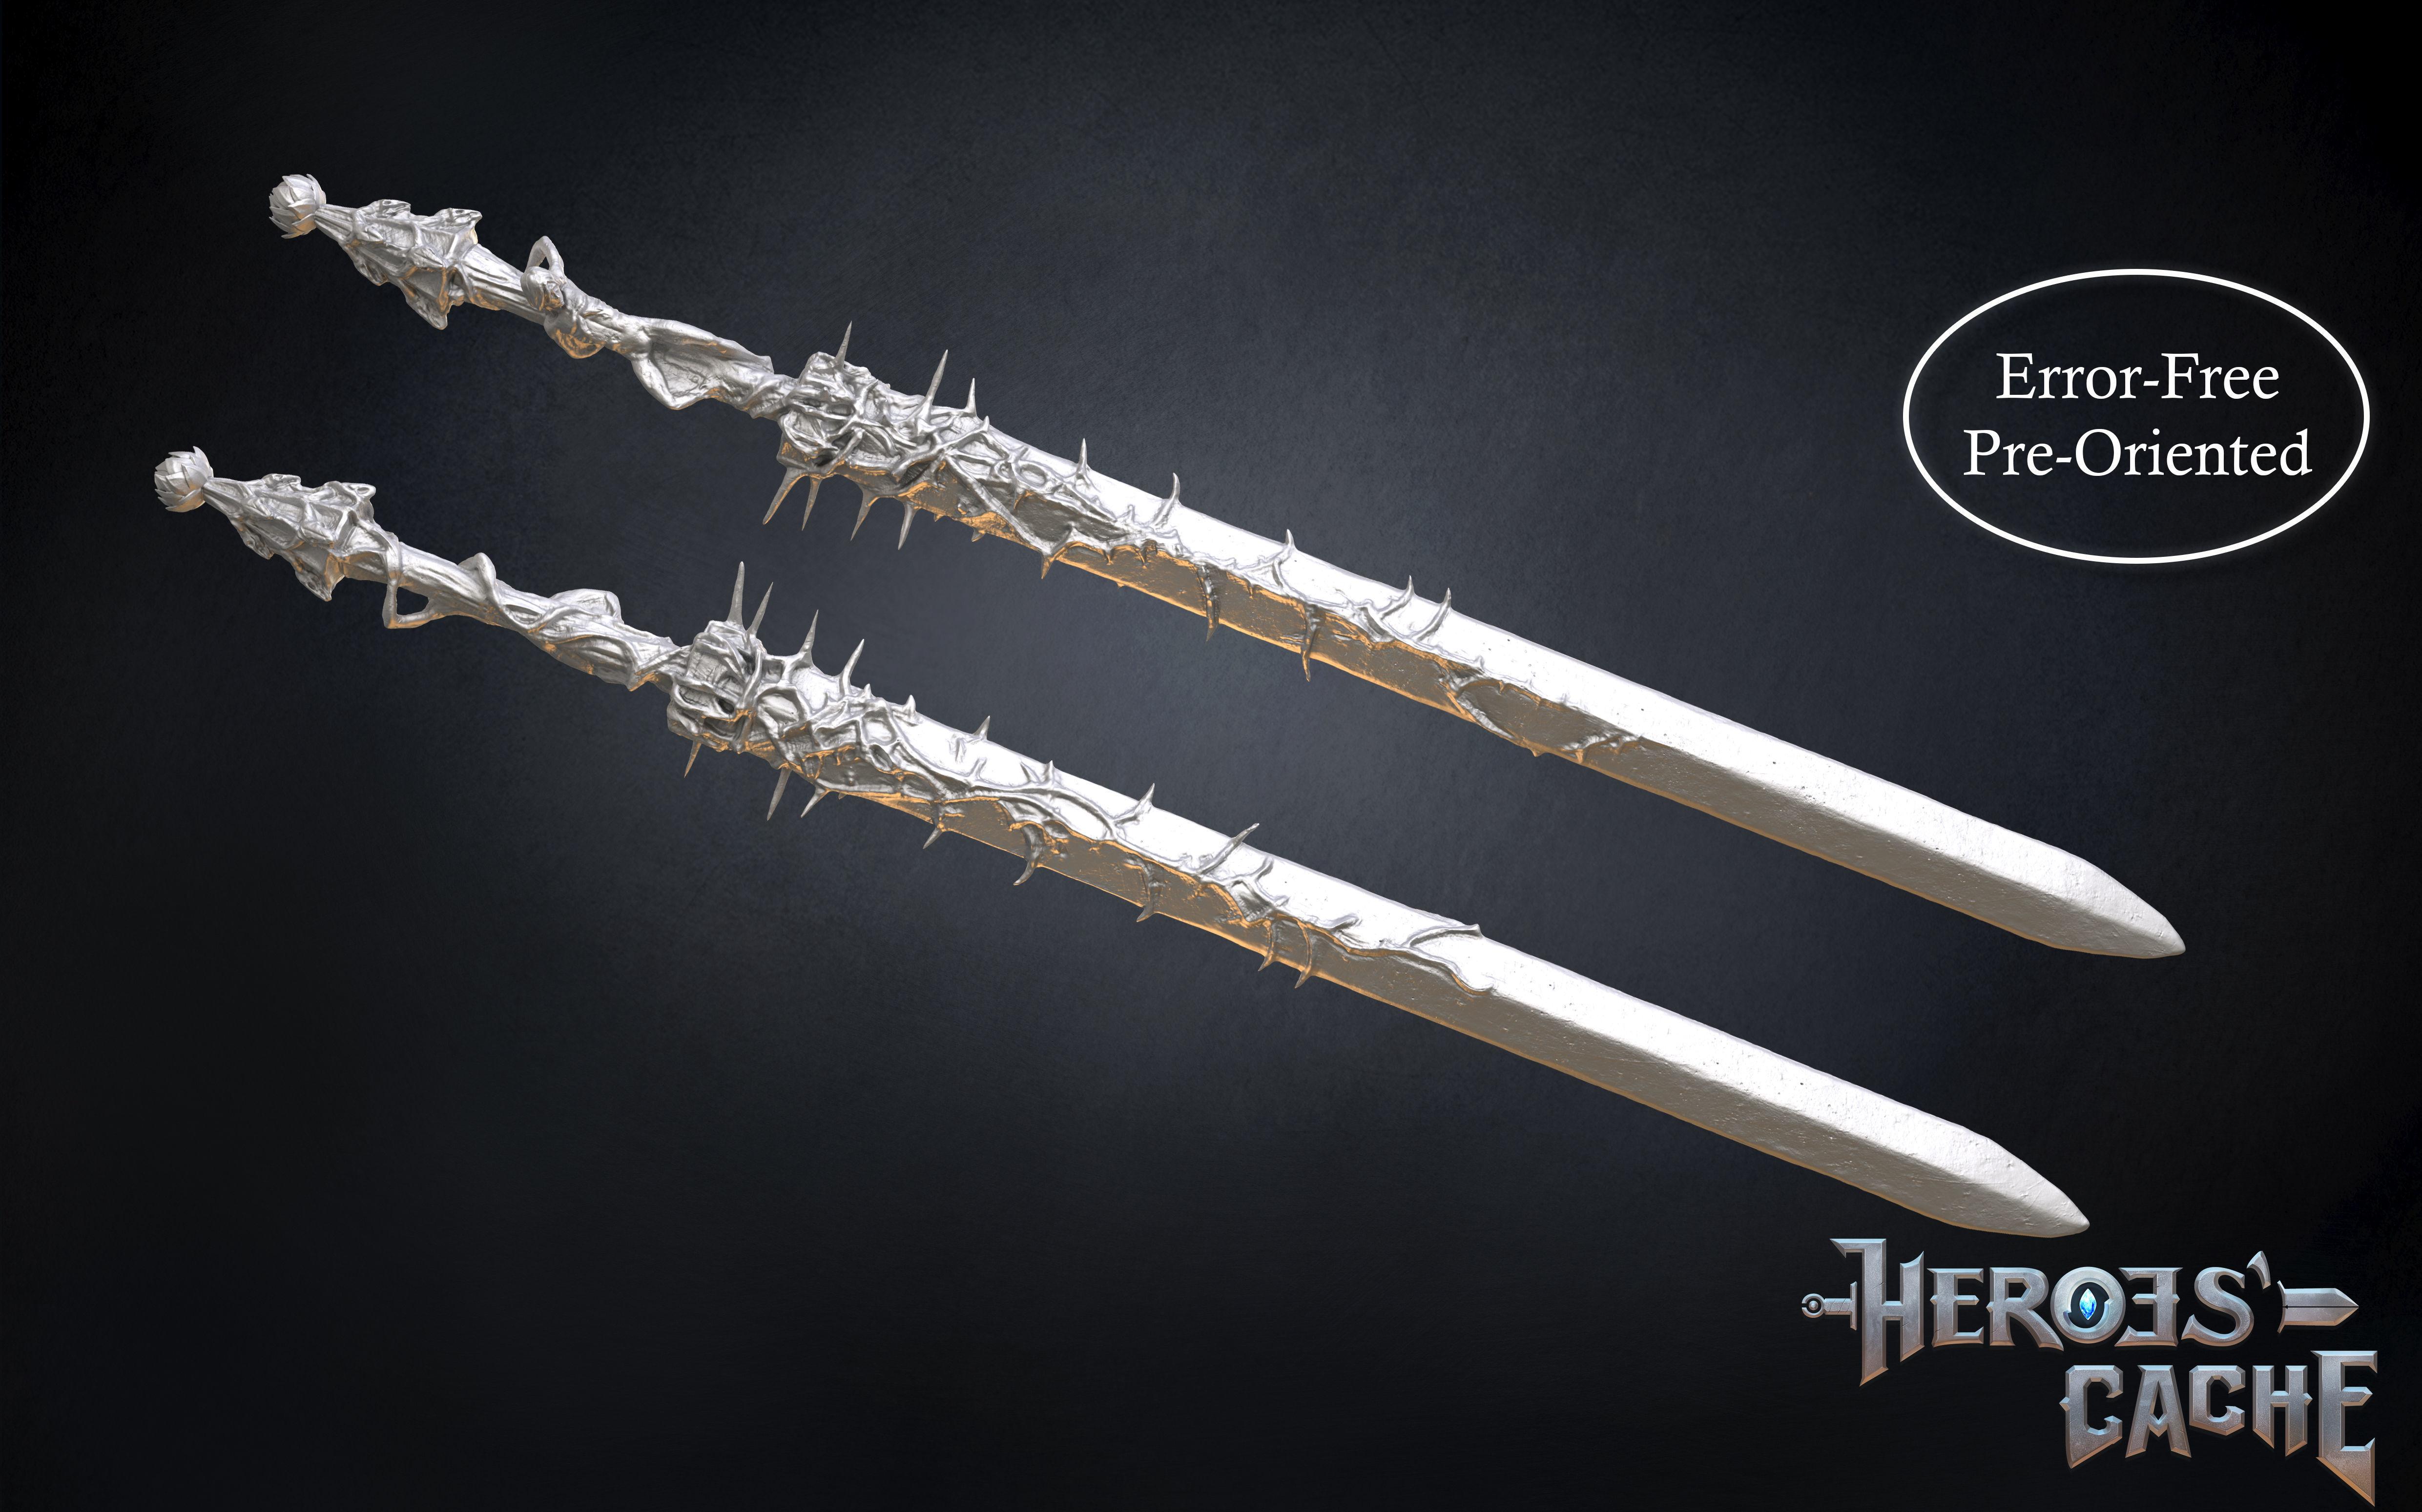 Blasphemous - Mea Culpa Sword